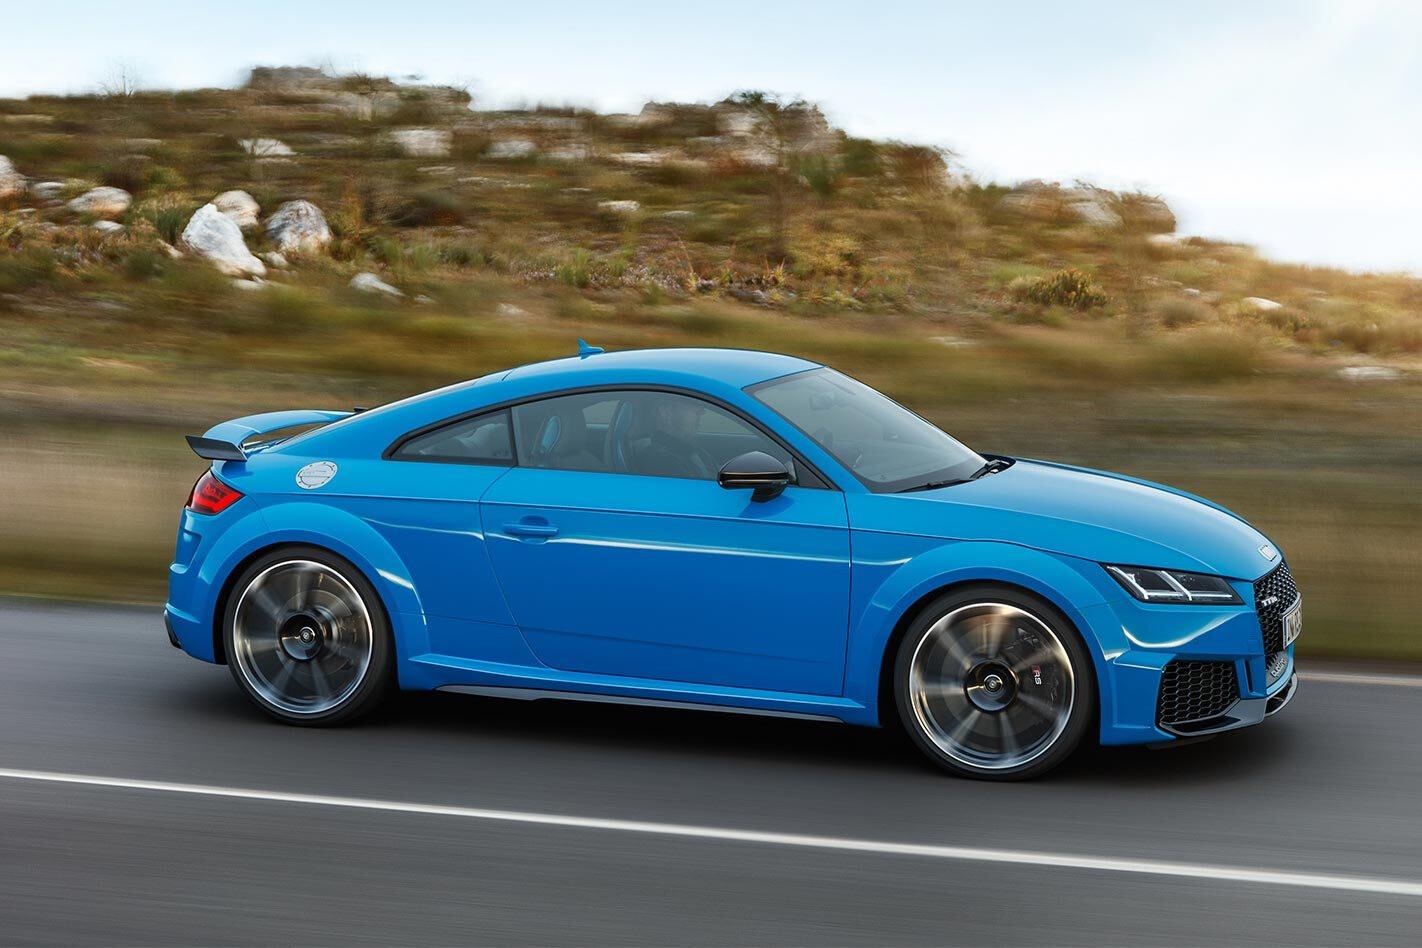 2020 Audi TT RS driving